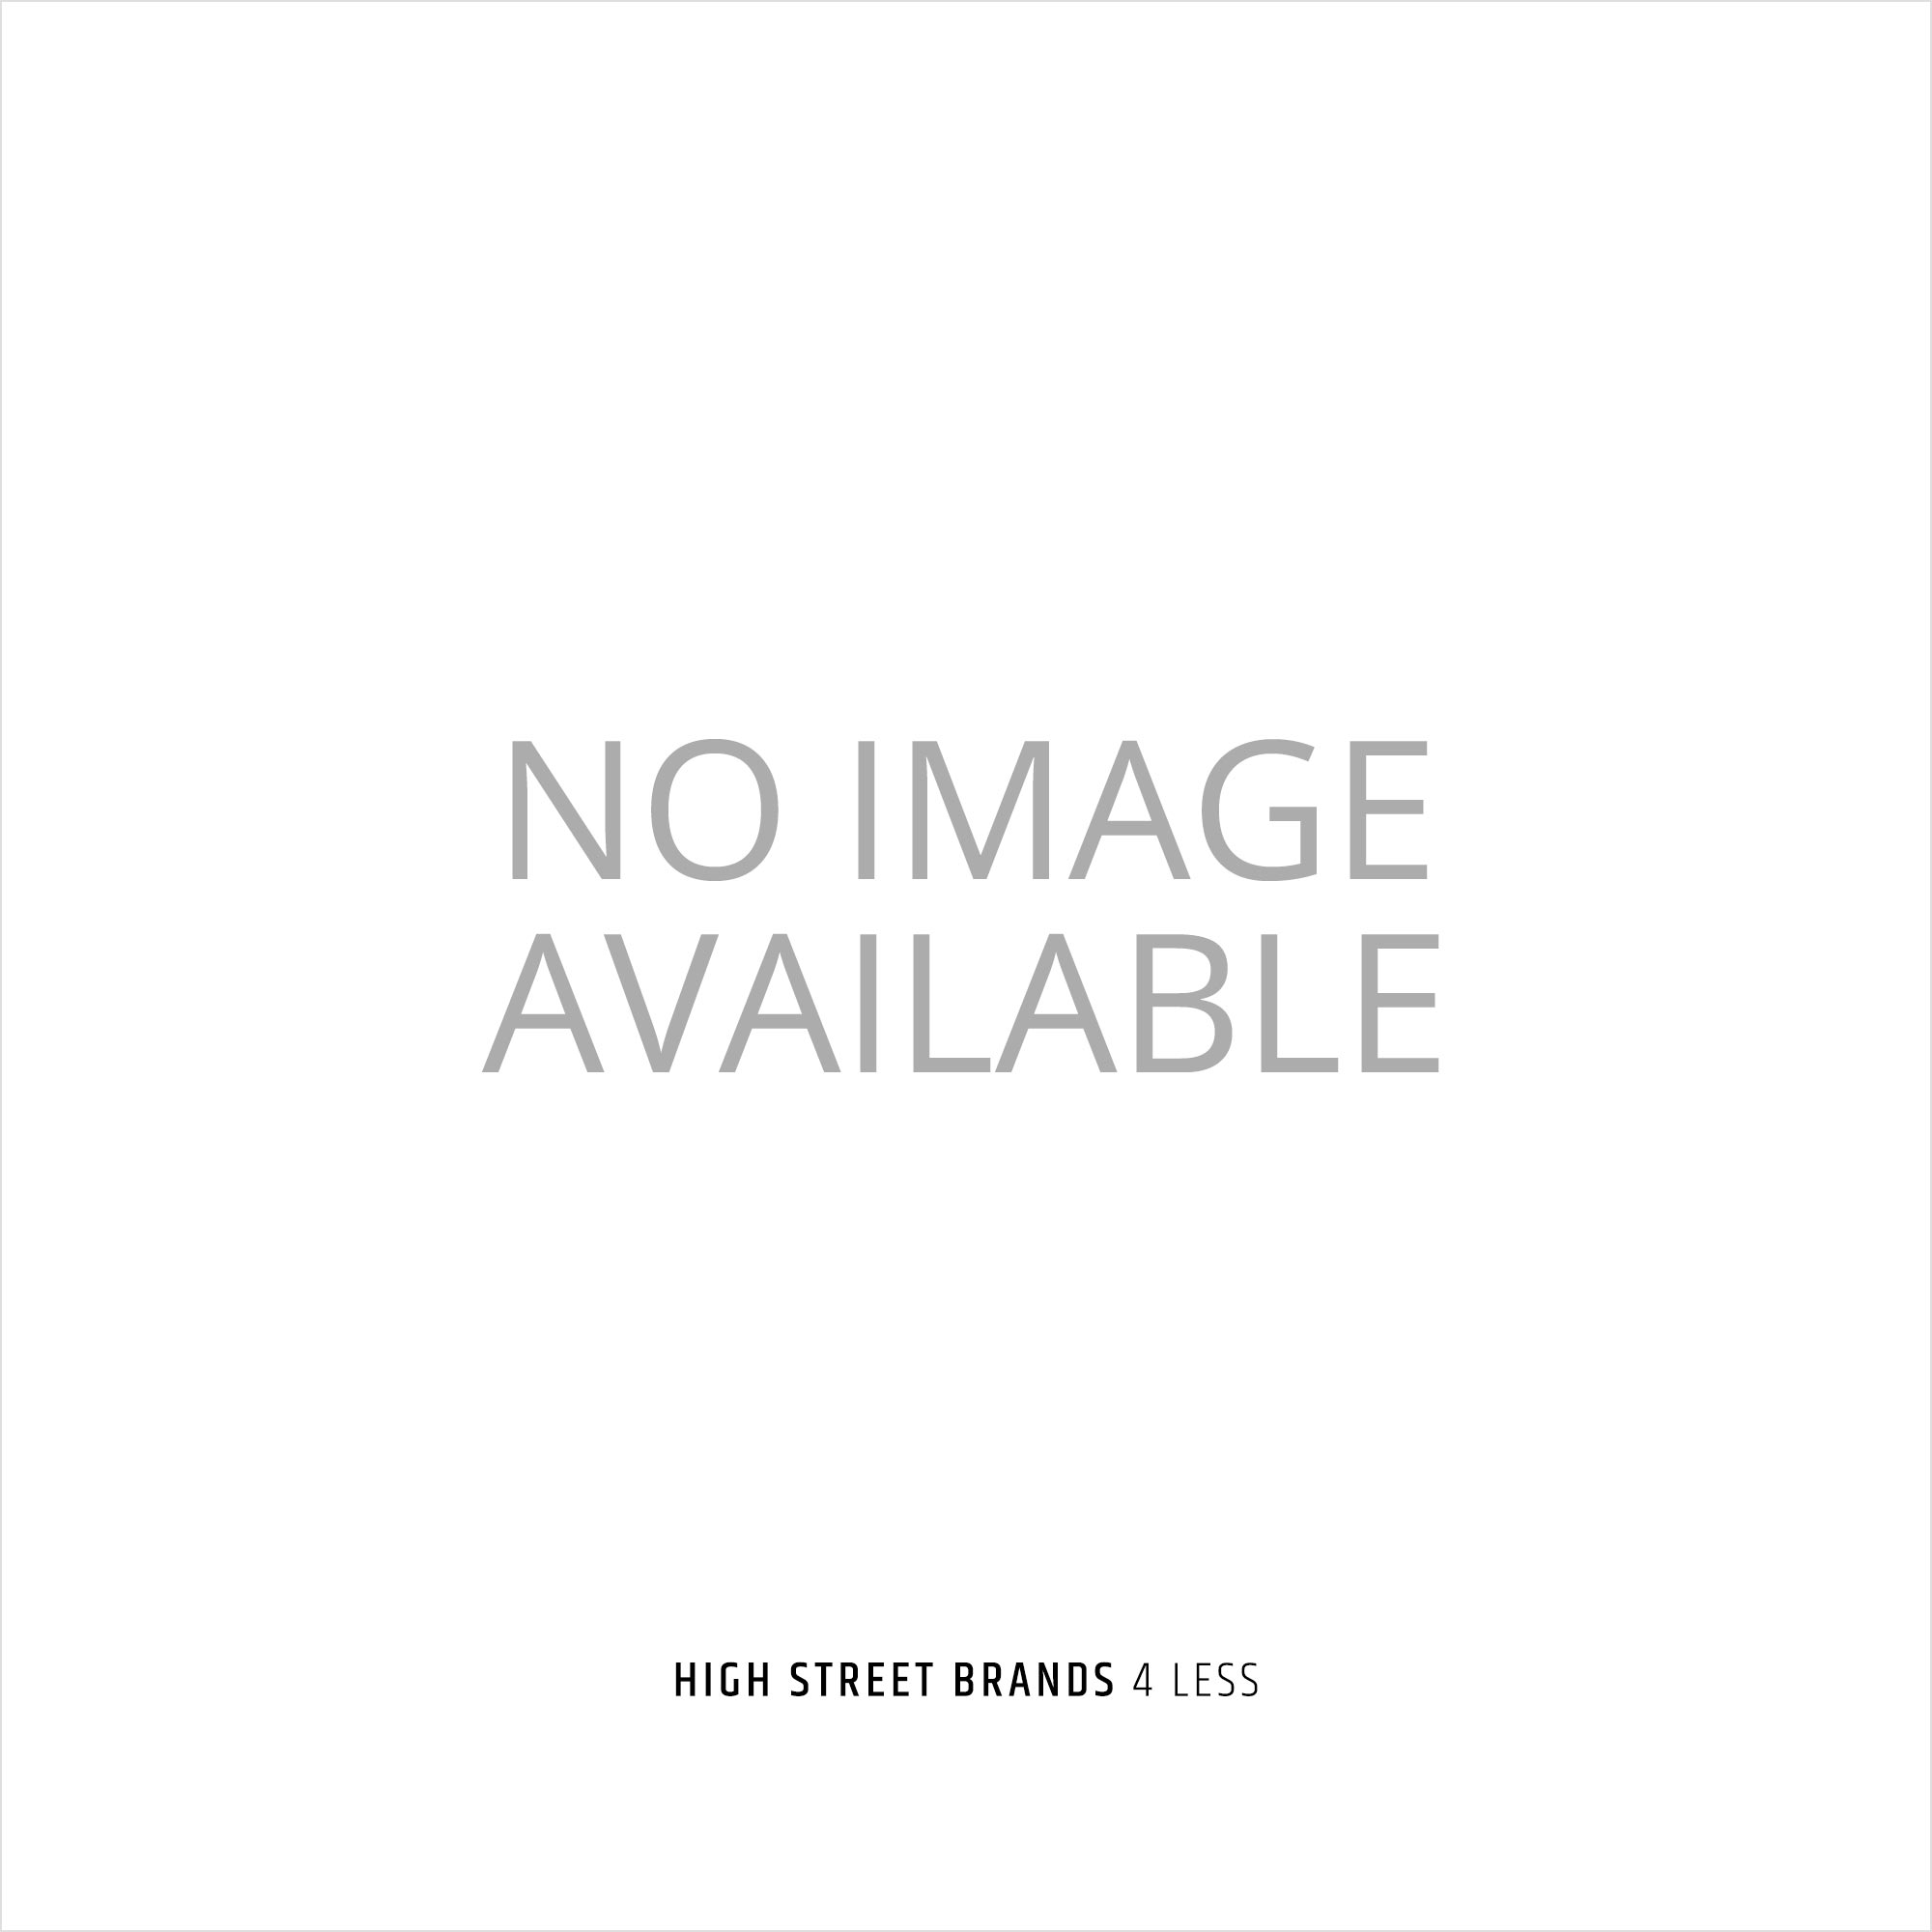 Bourjois Liner Feutre Slim Eyeliner Pen - 016 Black